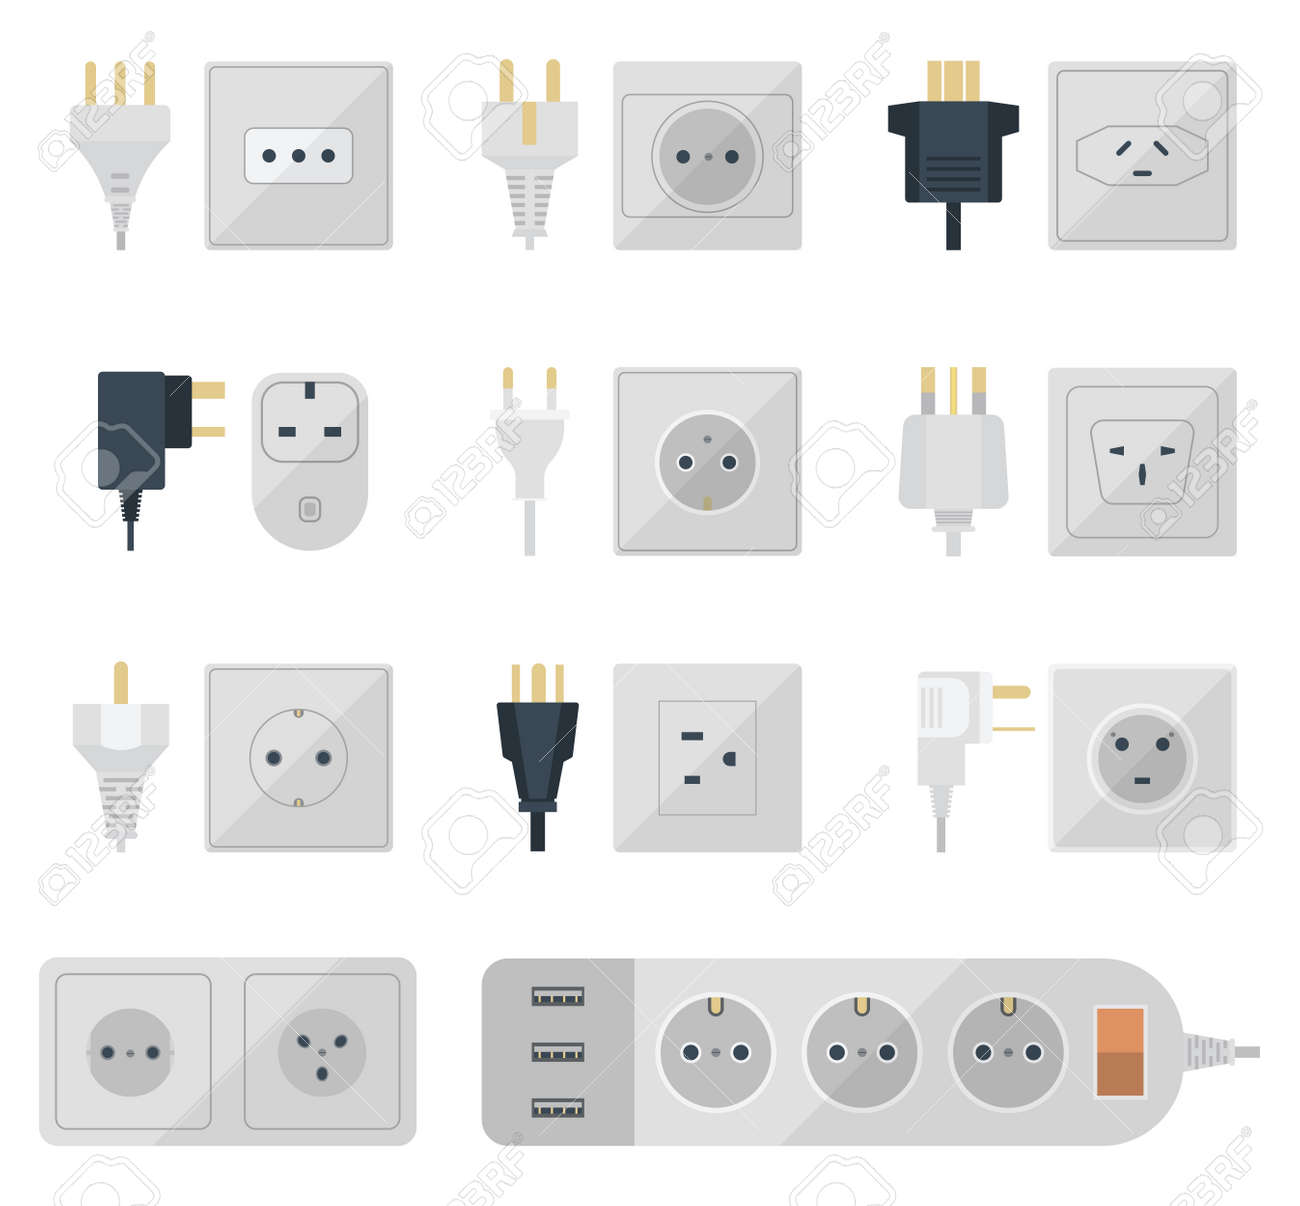 Electric Outlet Illustration On White Background. Energy Socket ...